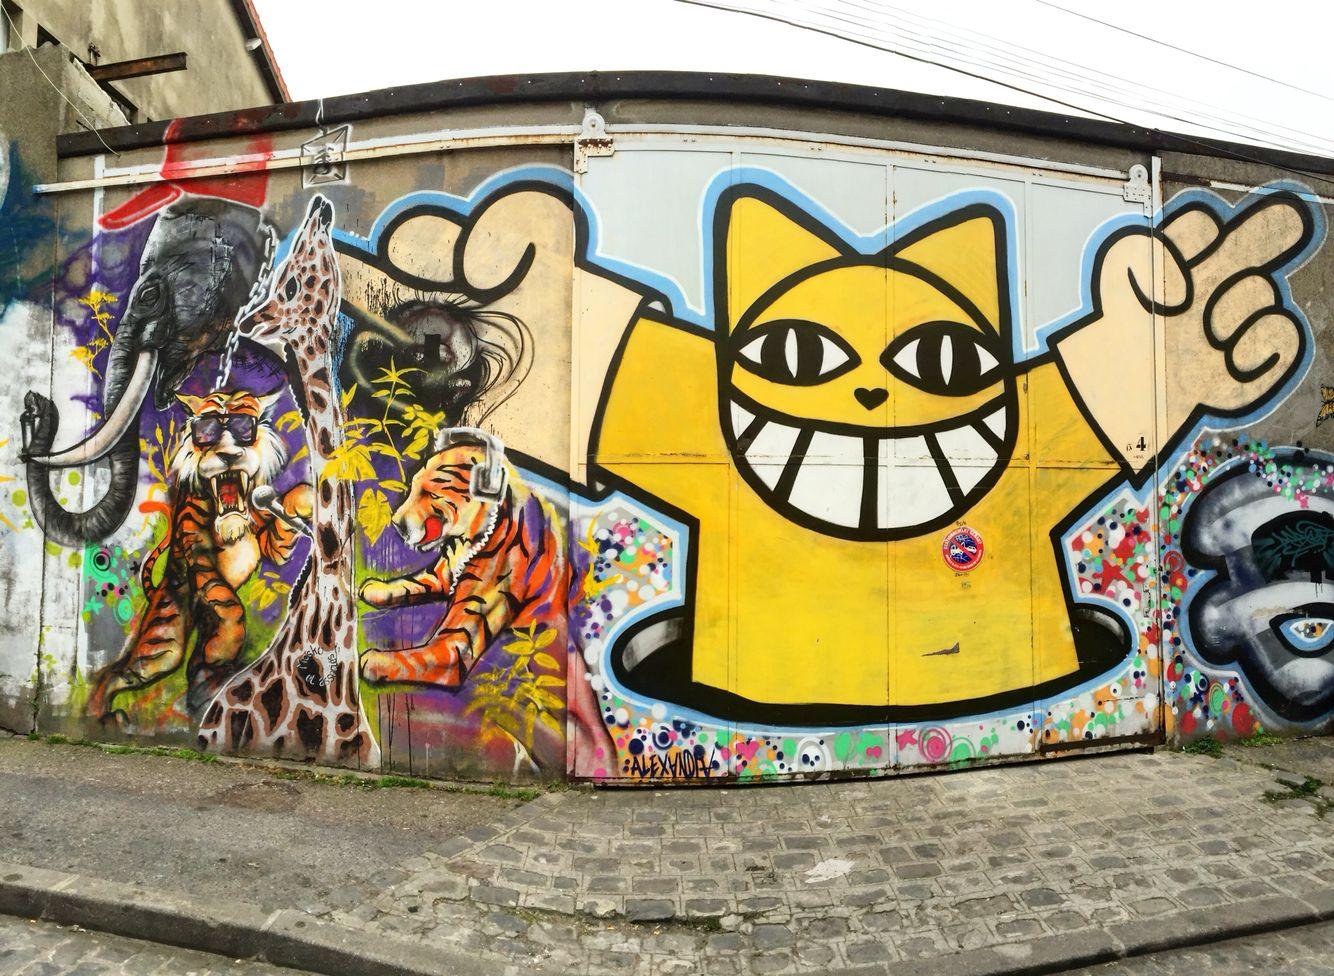 Pin by Vero on Street Art.. | Pinterest | Graffiti, Street art and ...